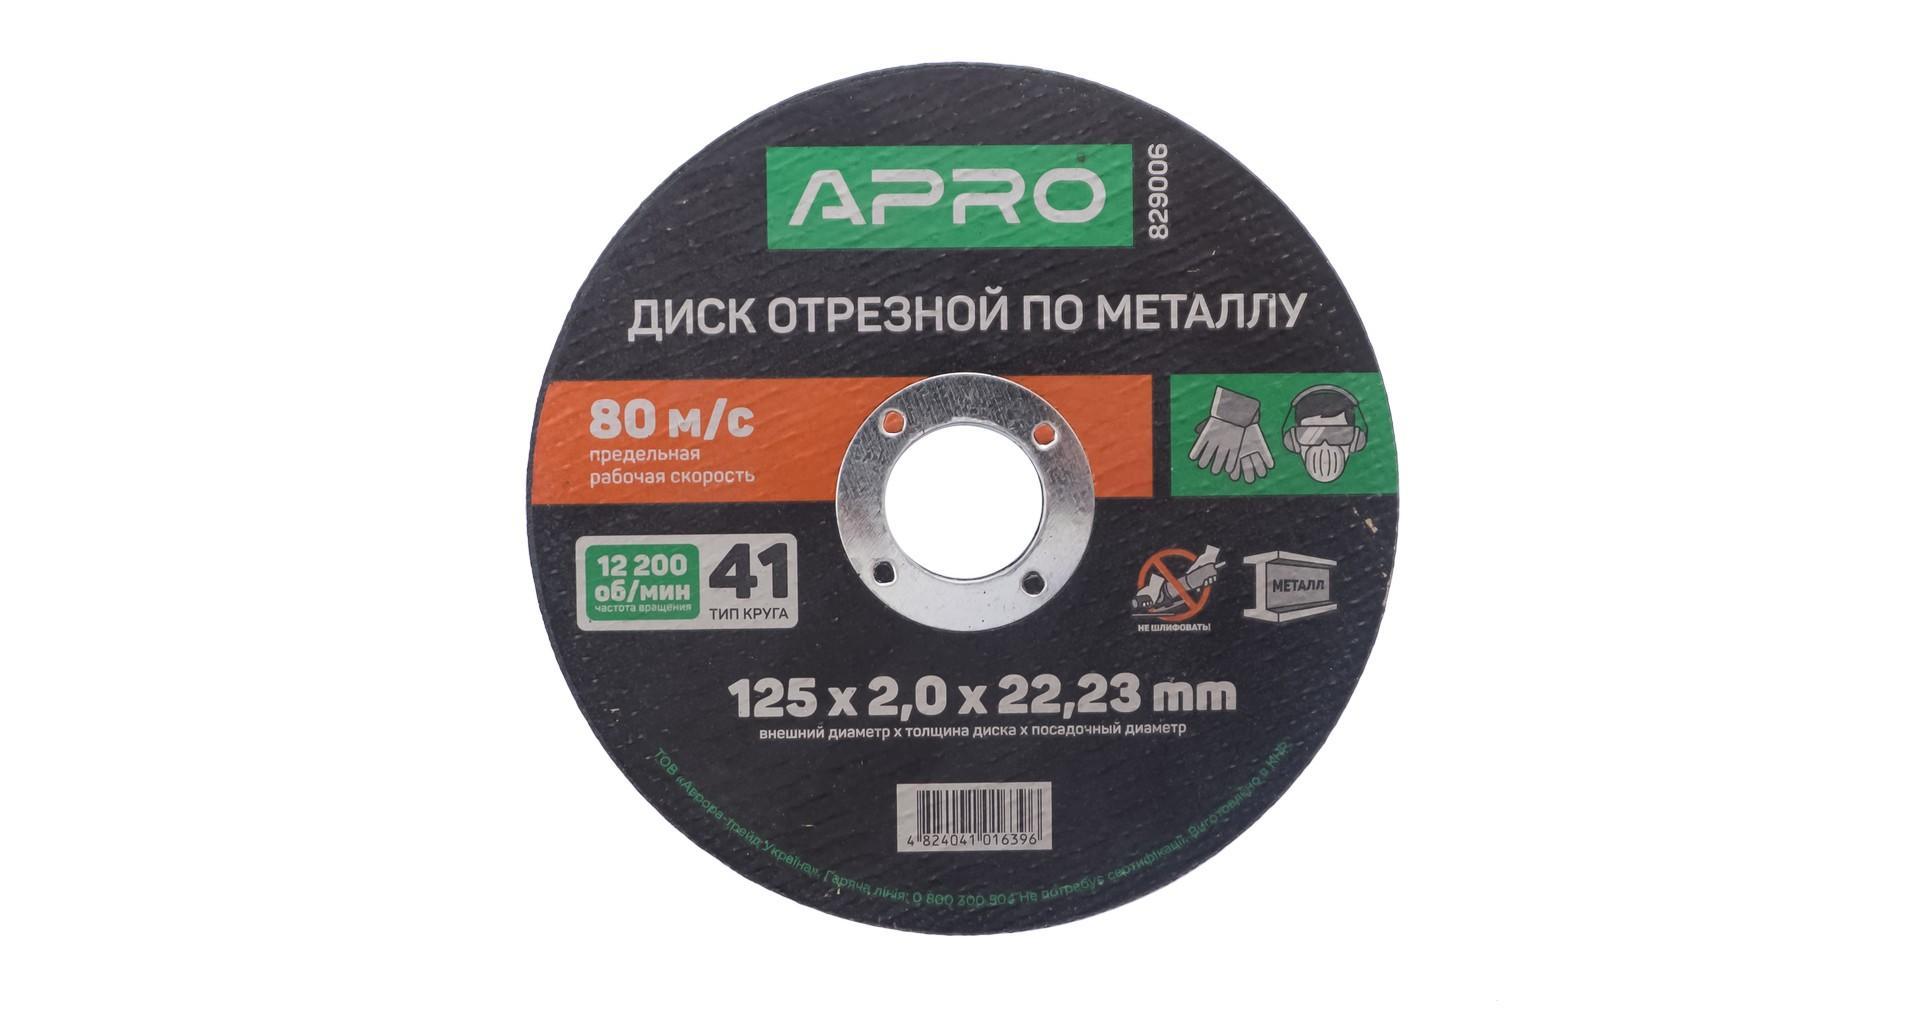 Диск отрезной по металлу Apro - 125 х 2,0 х 22,2 мм 3